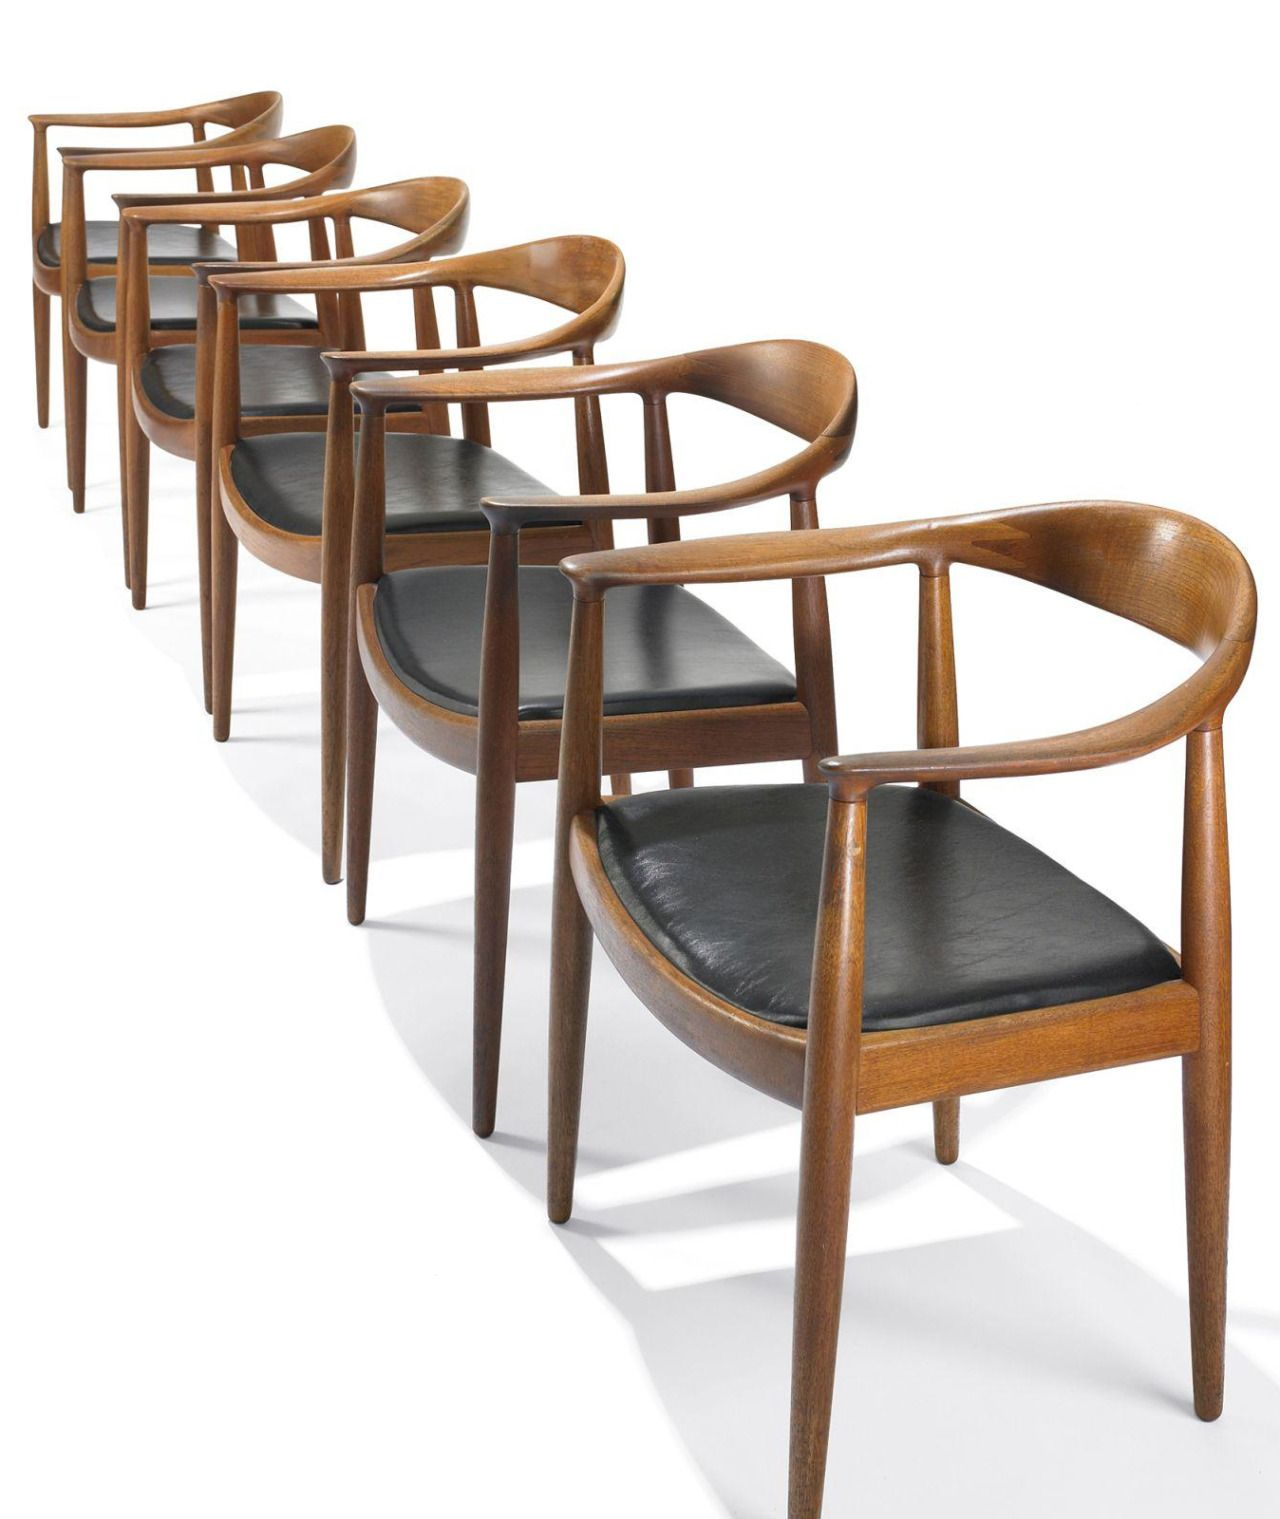 Stupendous Scandinavian Collectors The Chair Model Pp503 By Hans J Creativecarmelina Interior Chair Design Creativecarmelinacom